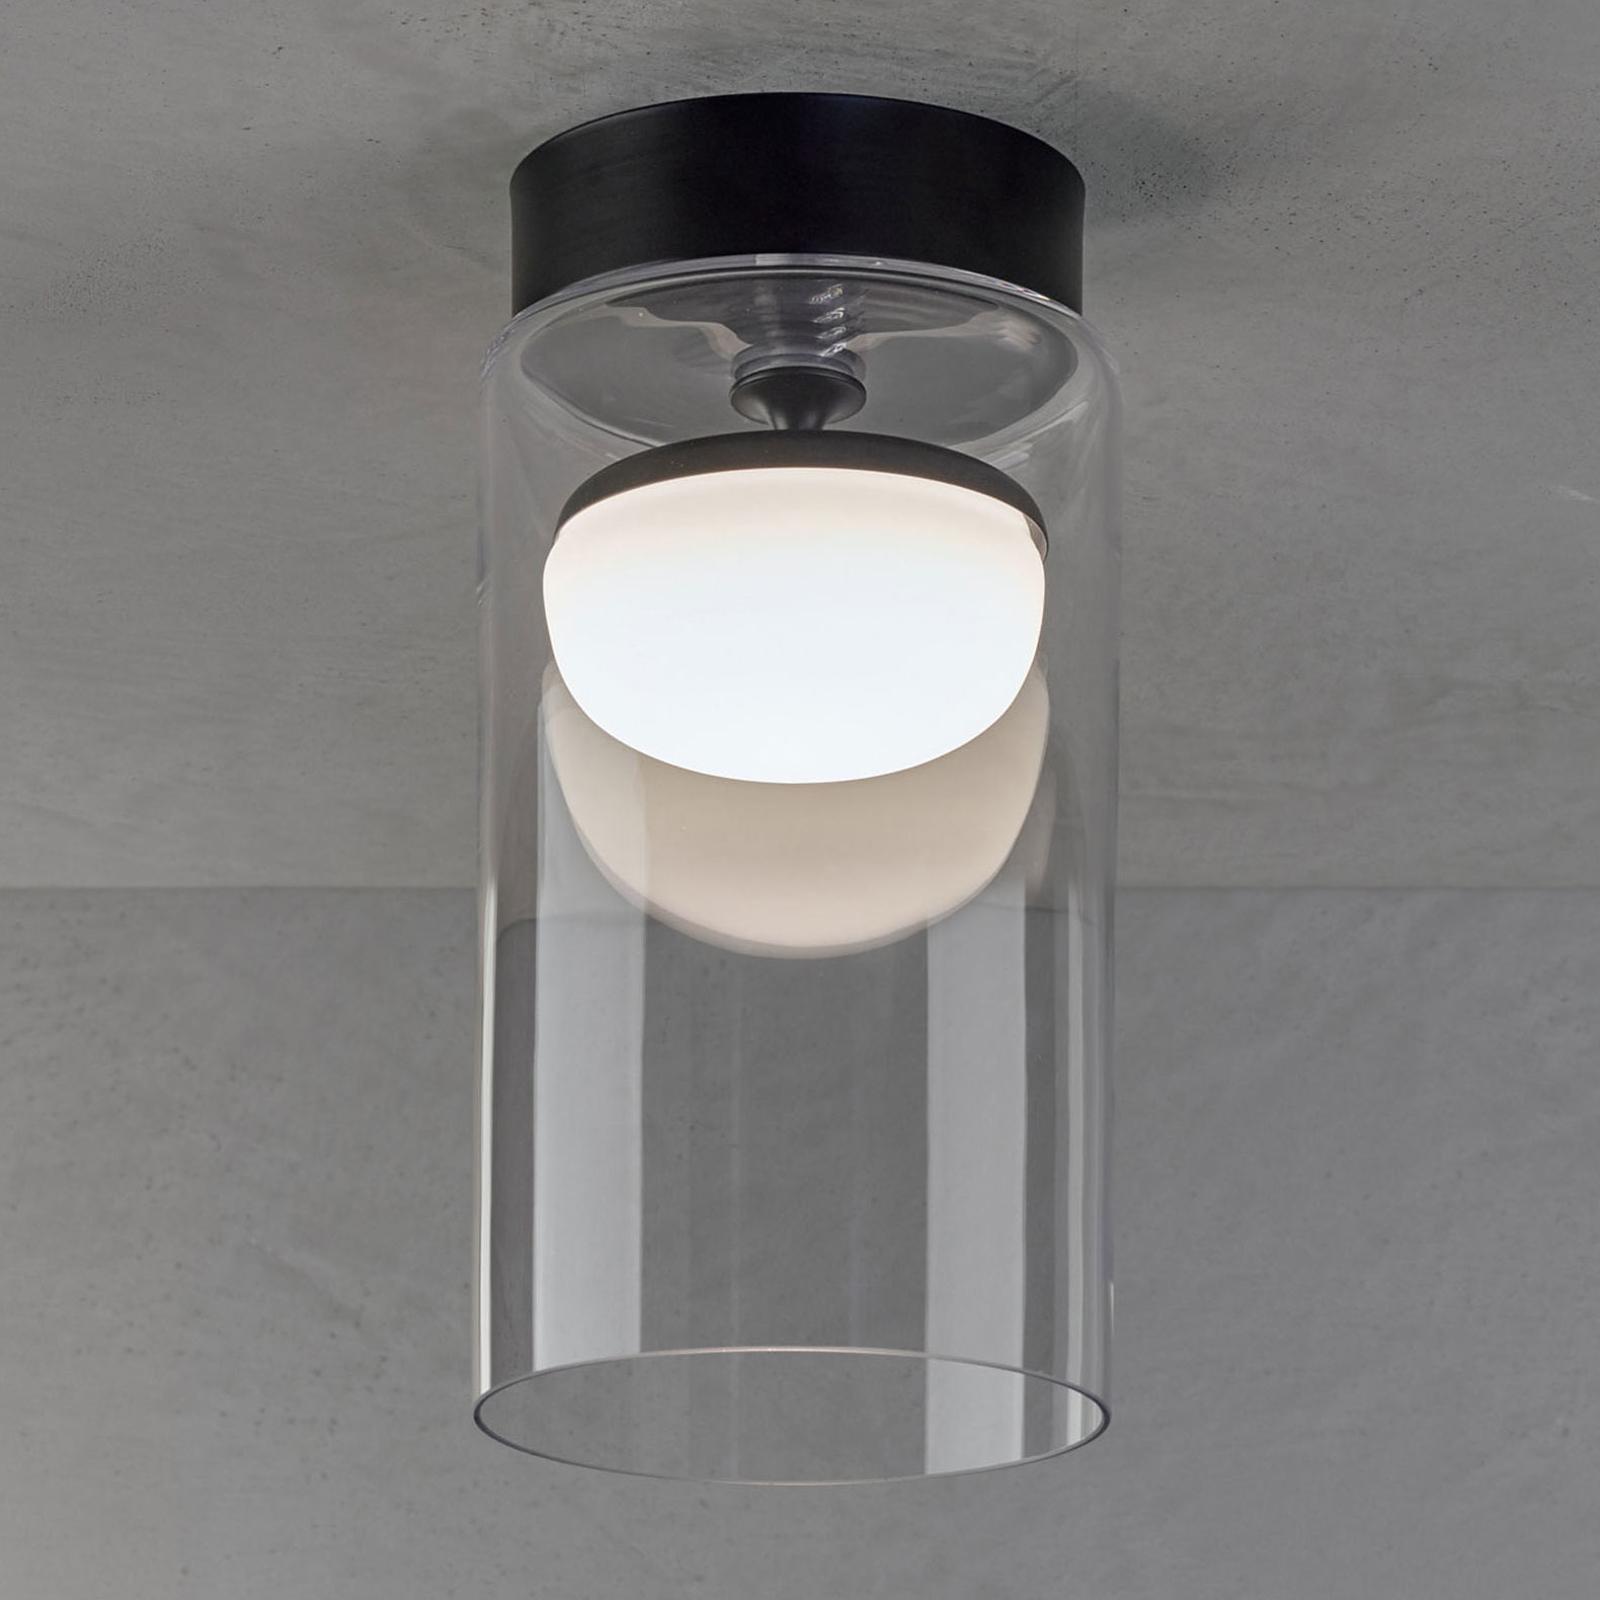 Prandina Diver LED-Deckenlampe C1 2.700K schwarz